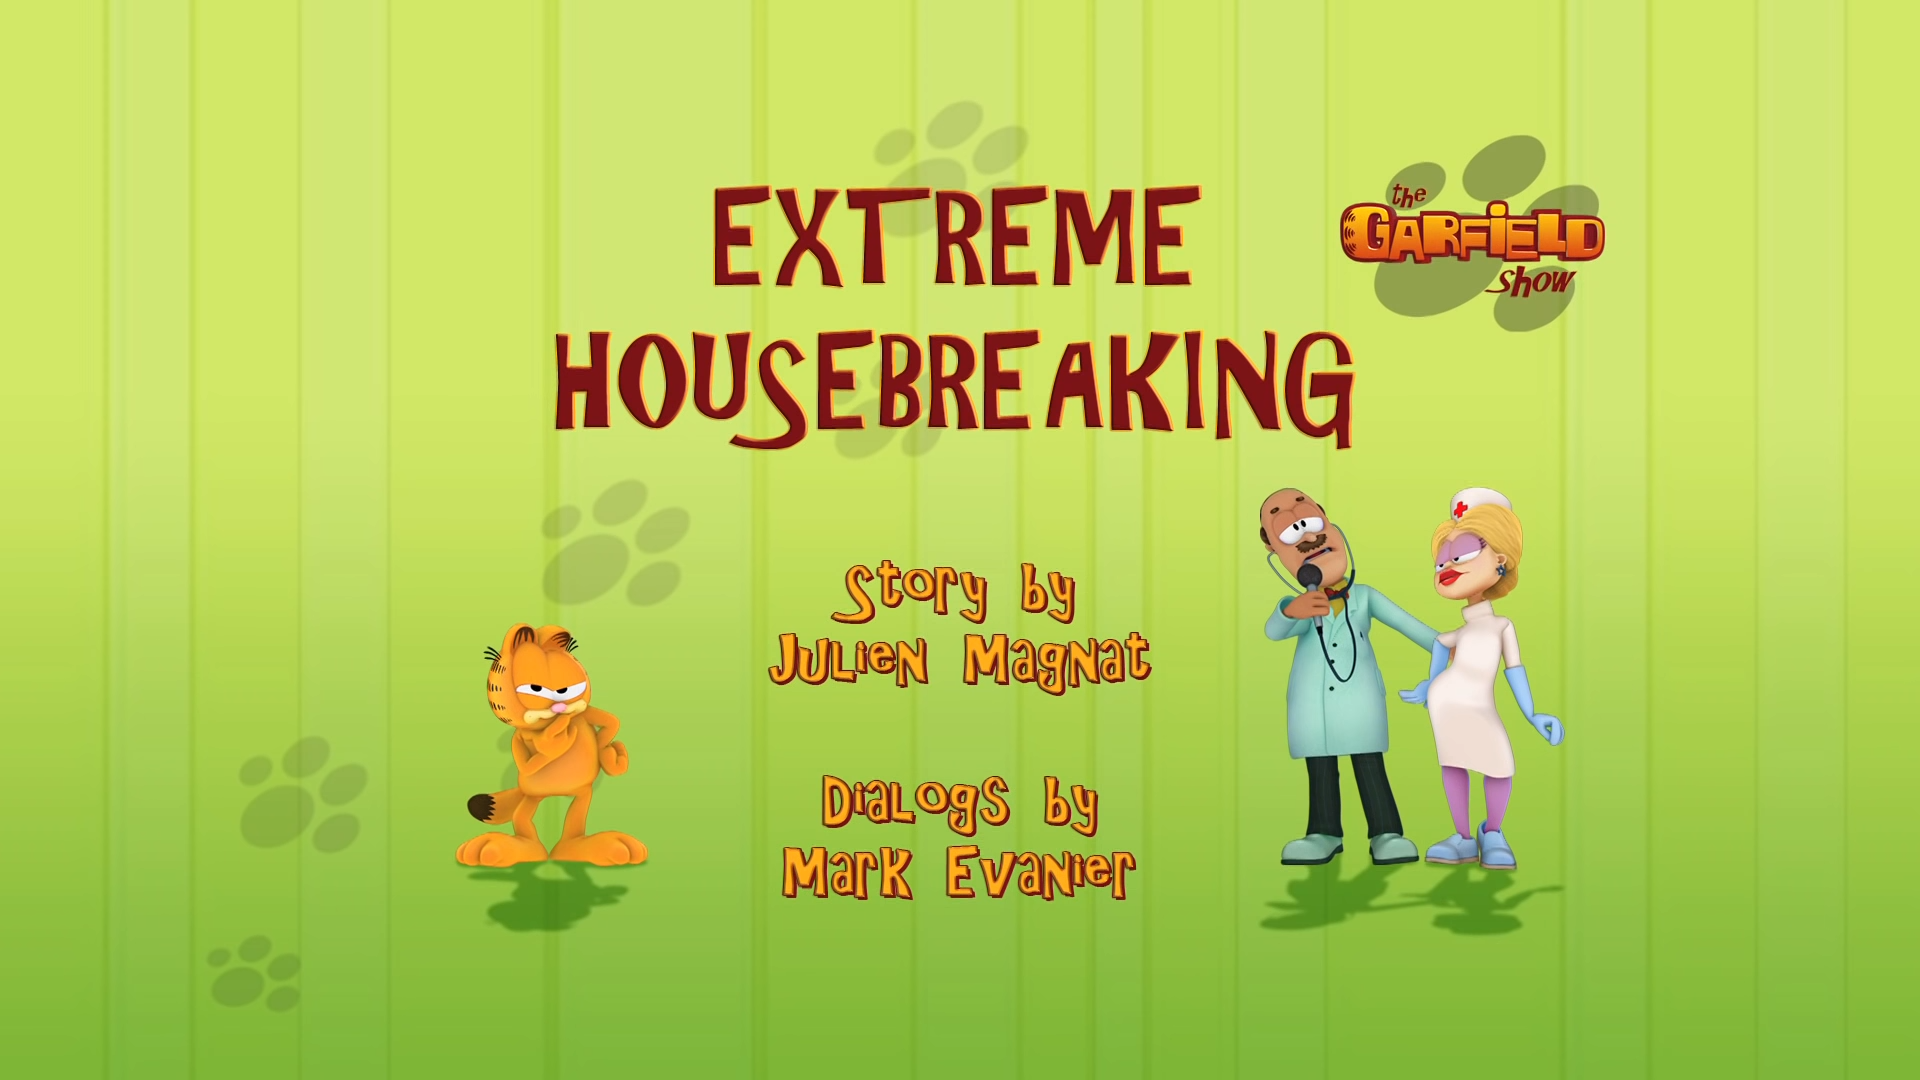 Extreme Housebreaking